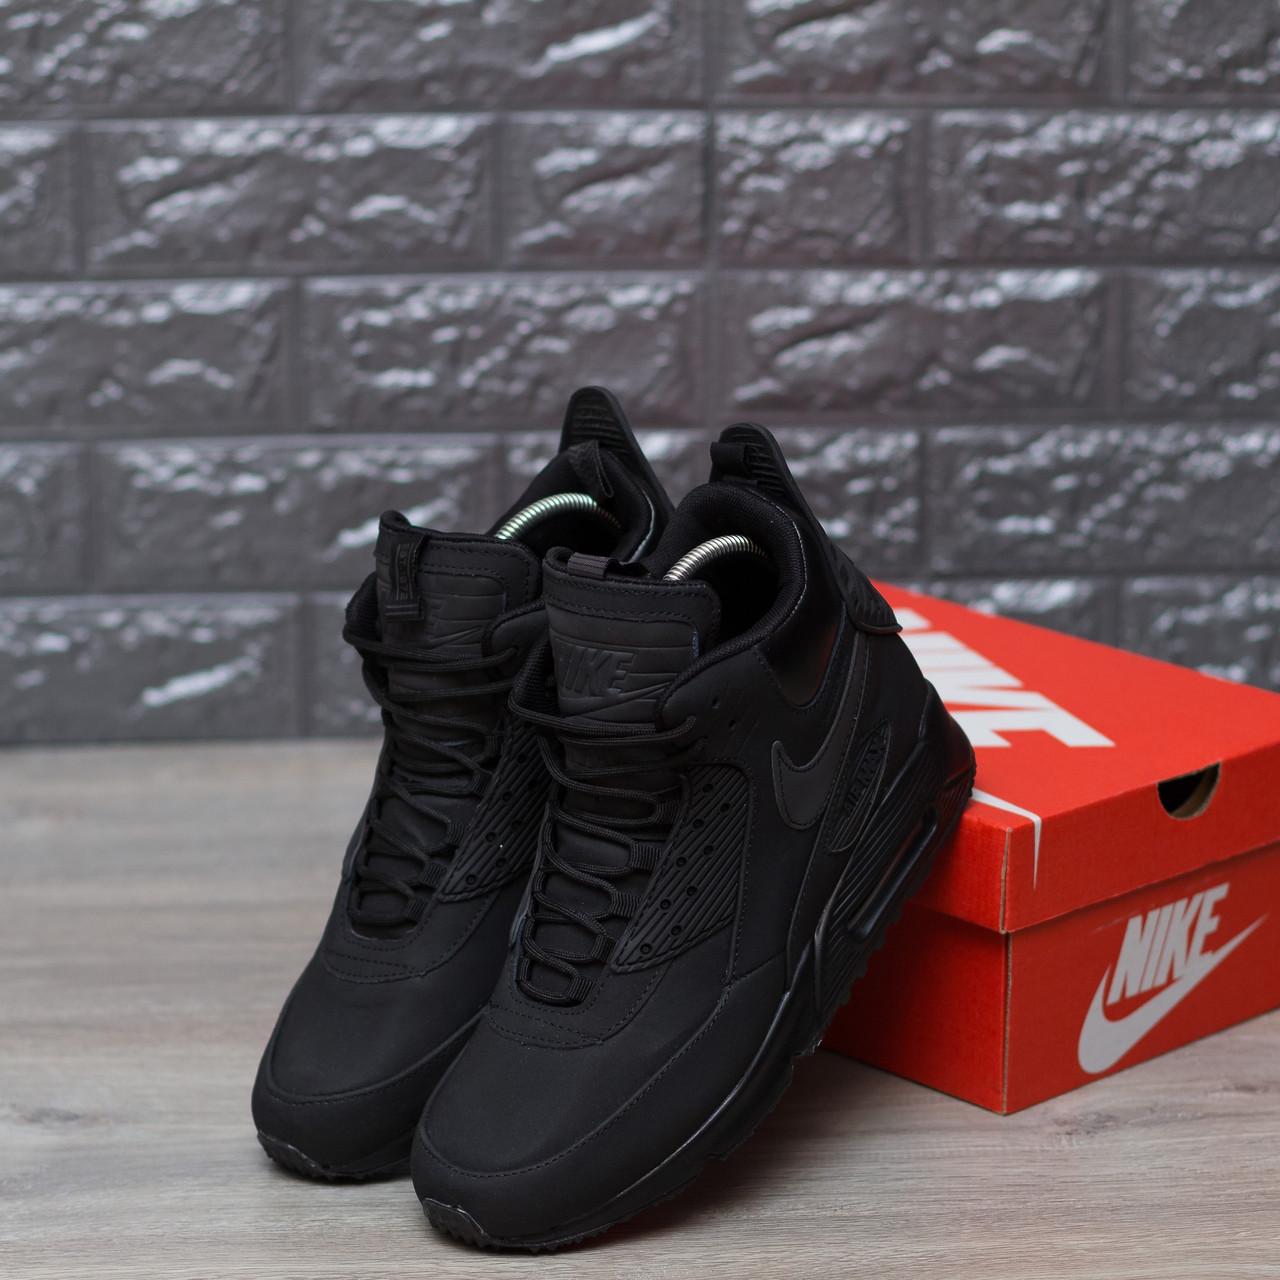 a790f824 Мужские зимние кроссовки Nike air max 90 winter black - Интернет-магазин